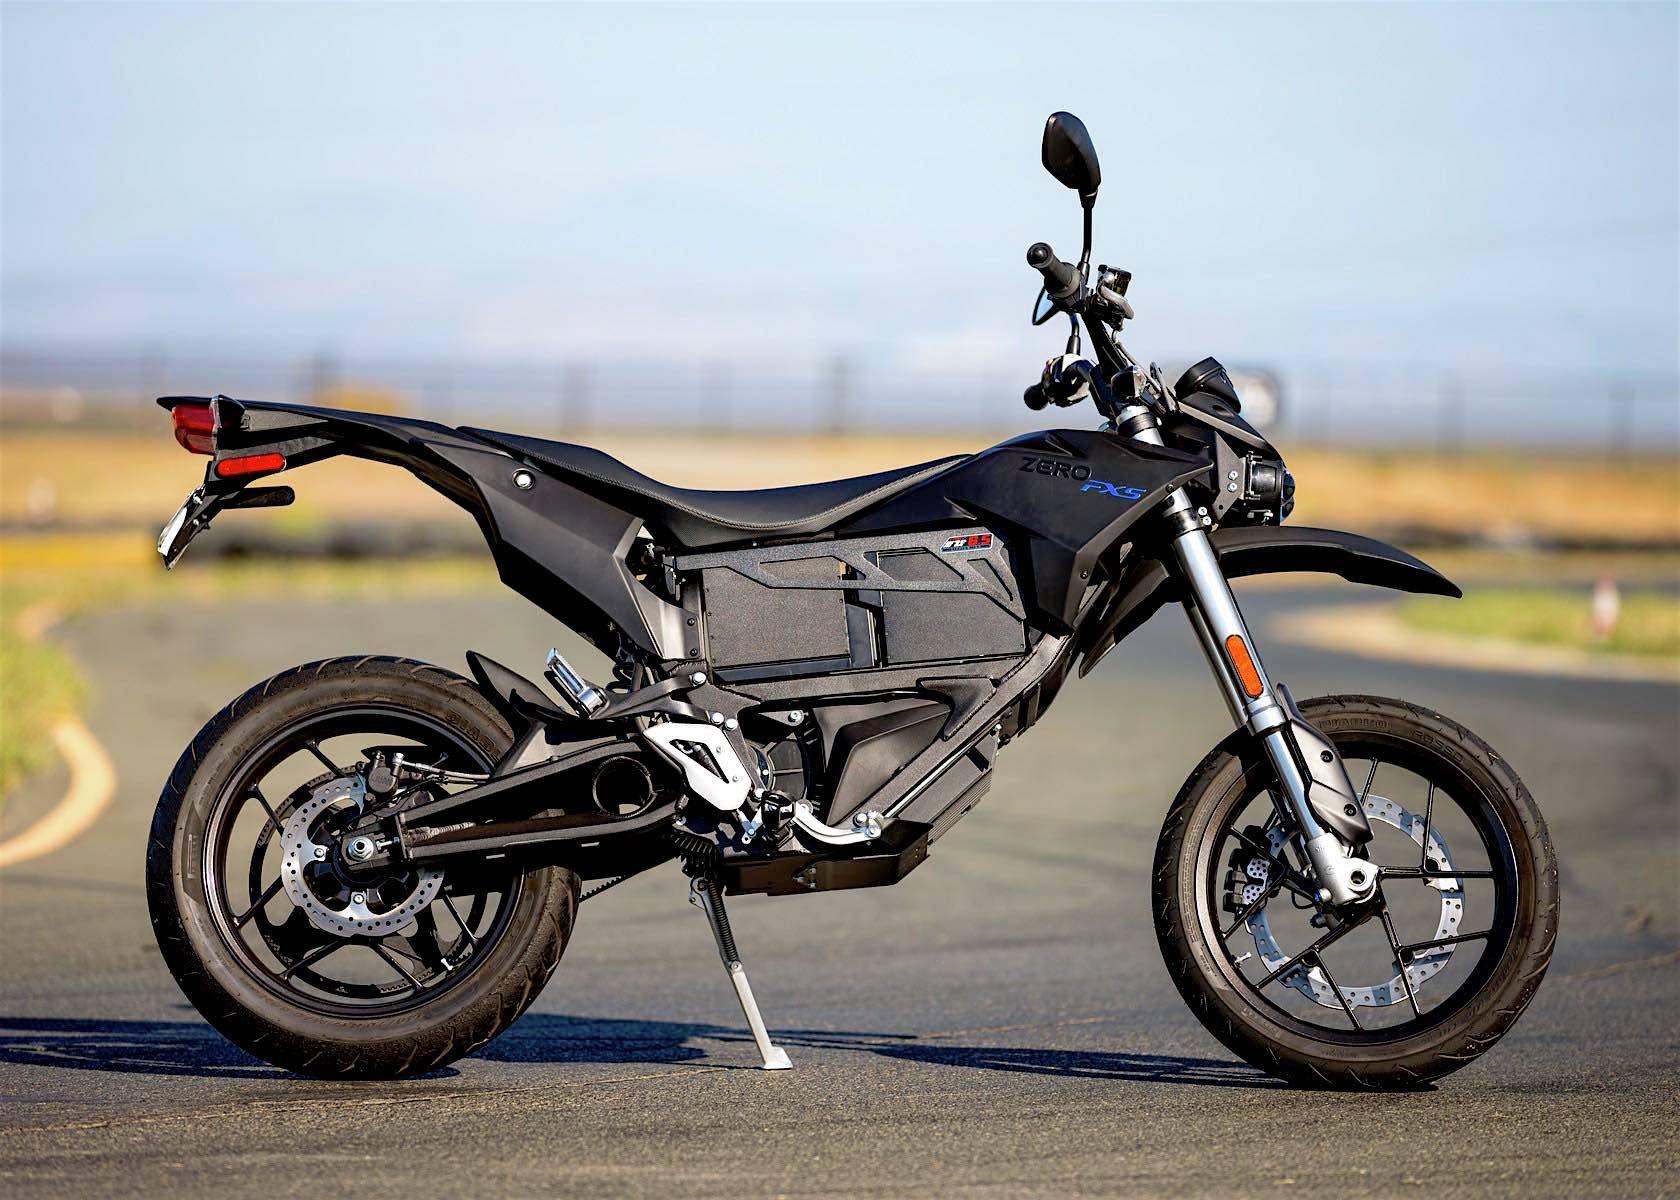 The 2016 Zero FXS Electric Motorcycle